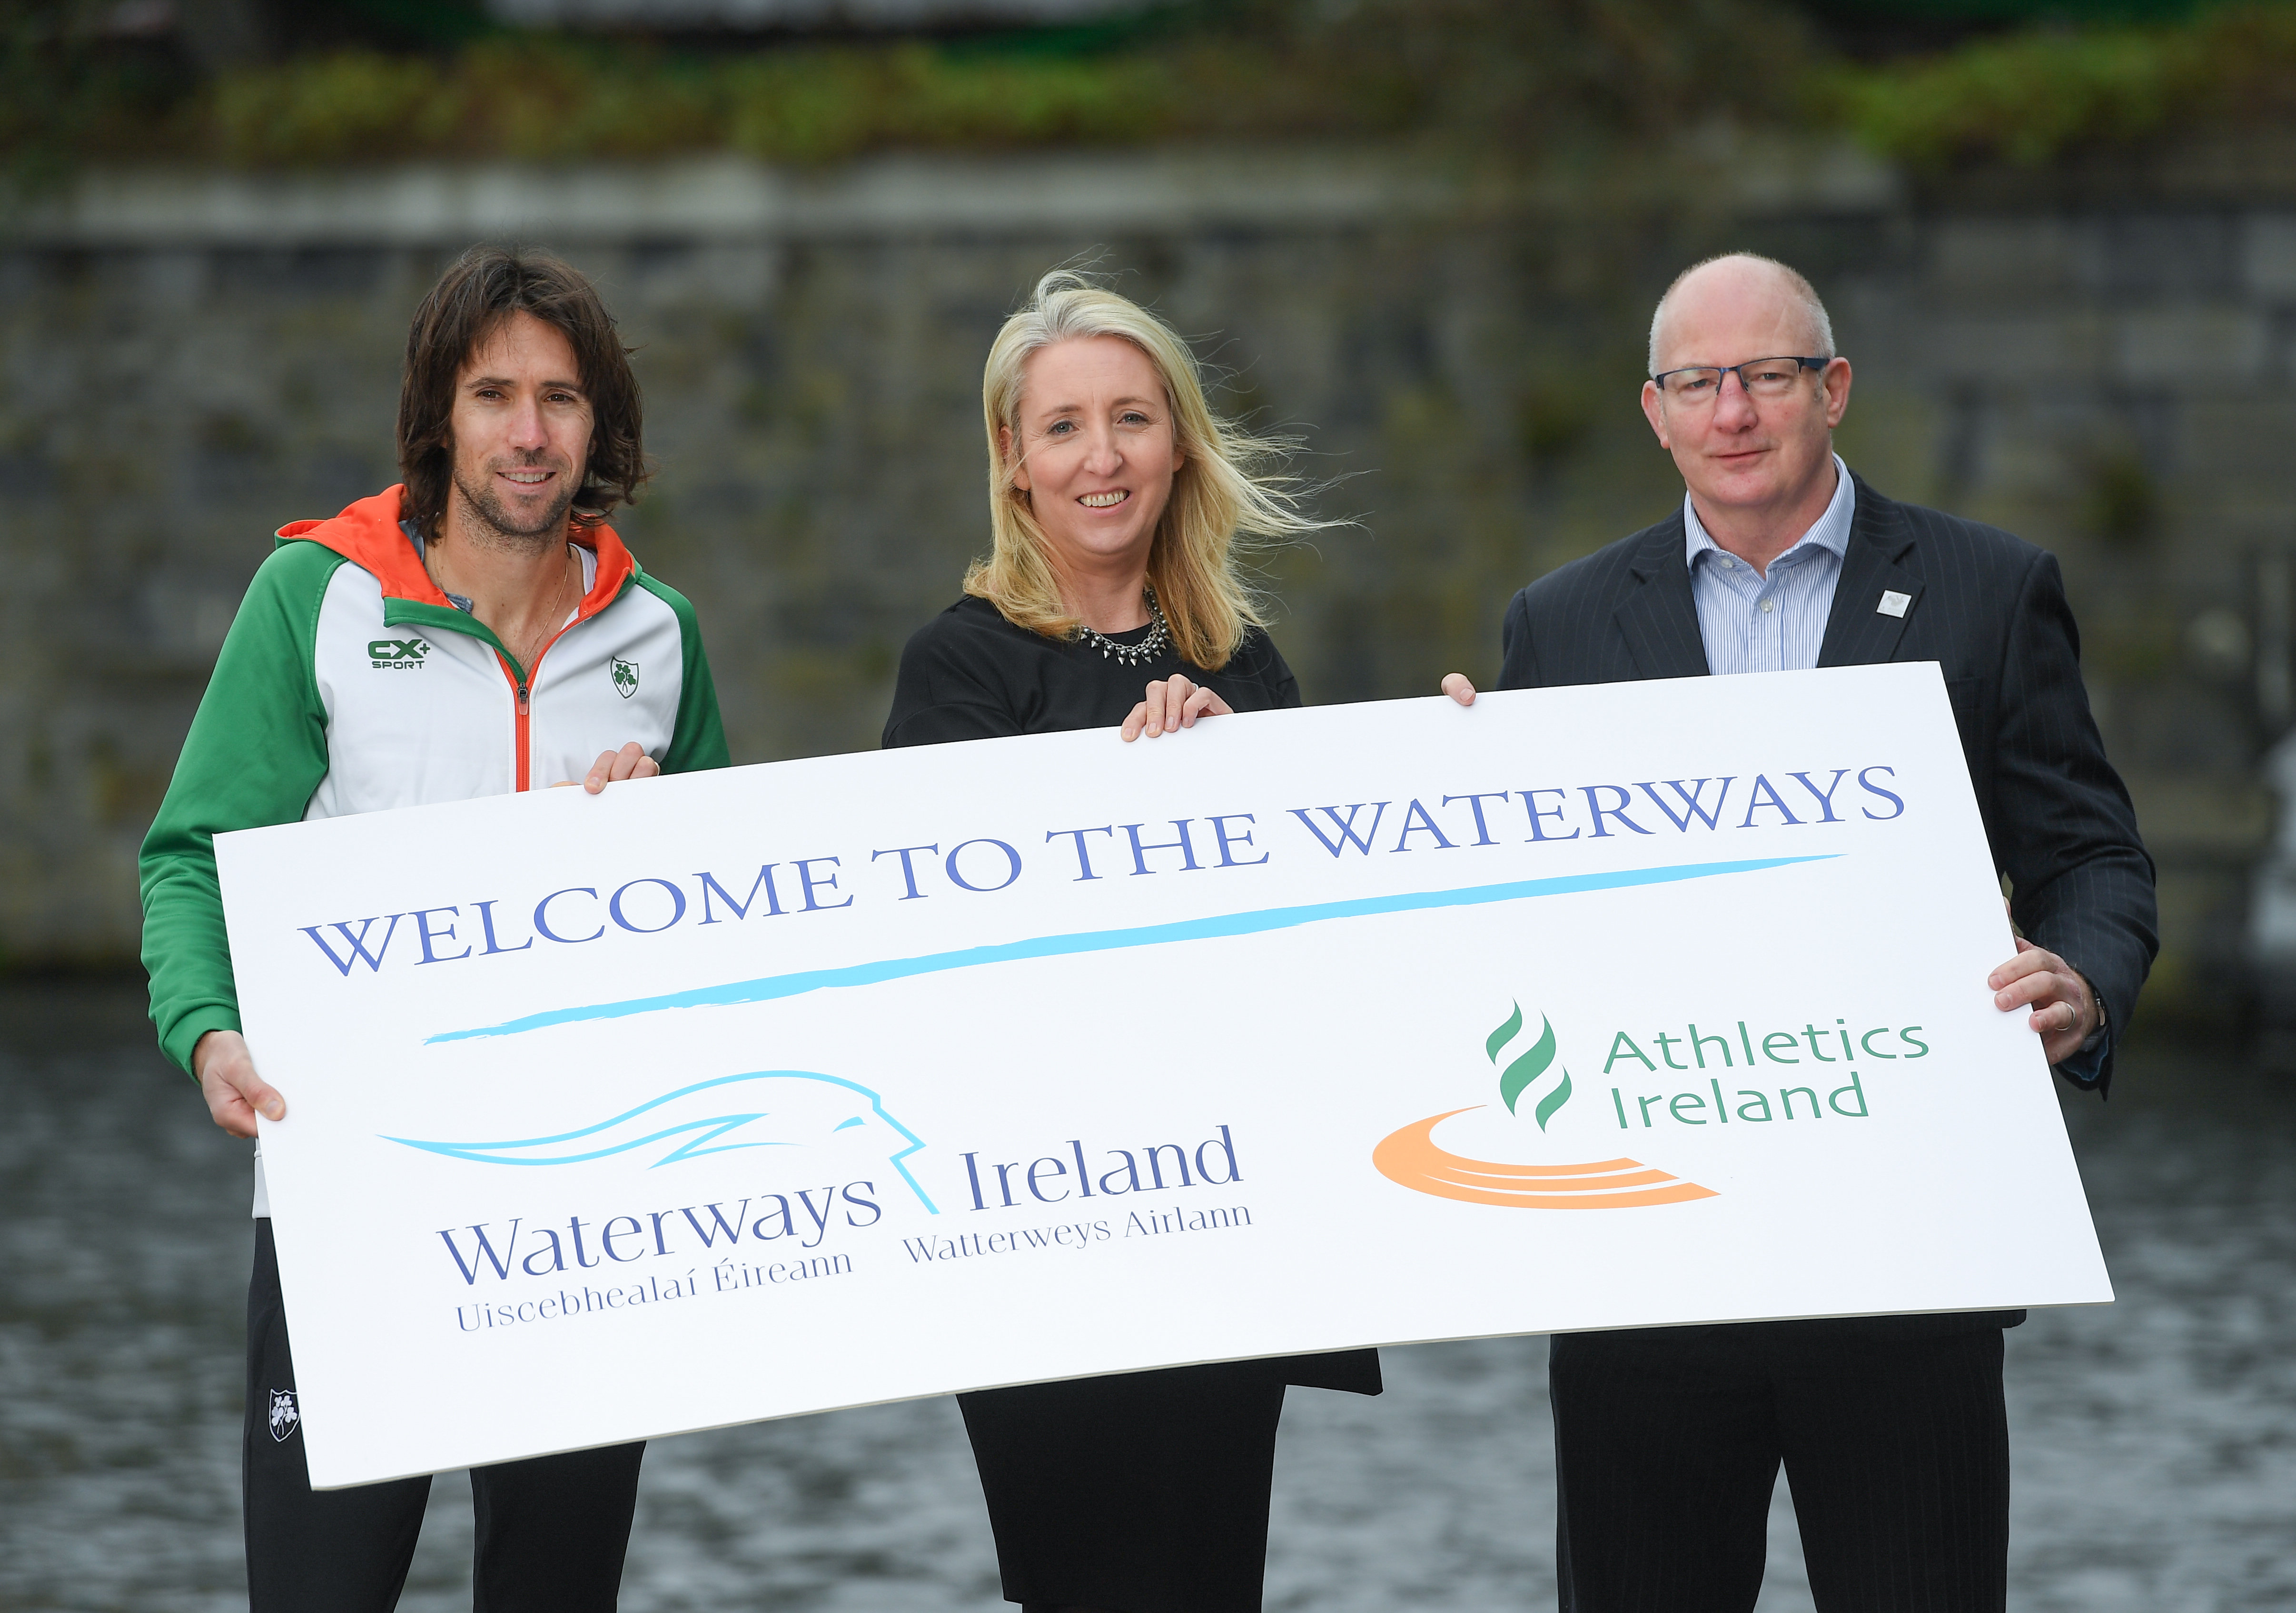 Athletics Ireland and Waterways Ireland Launch Strategic Partnership